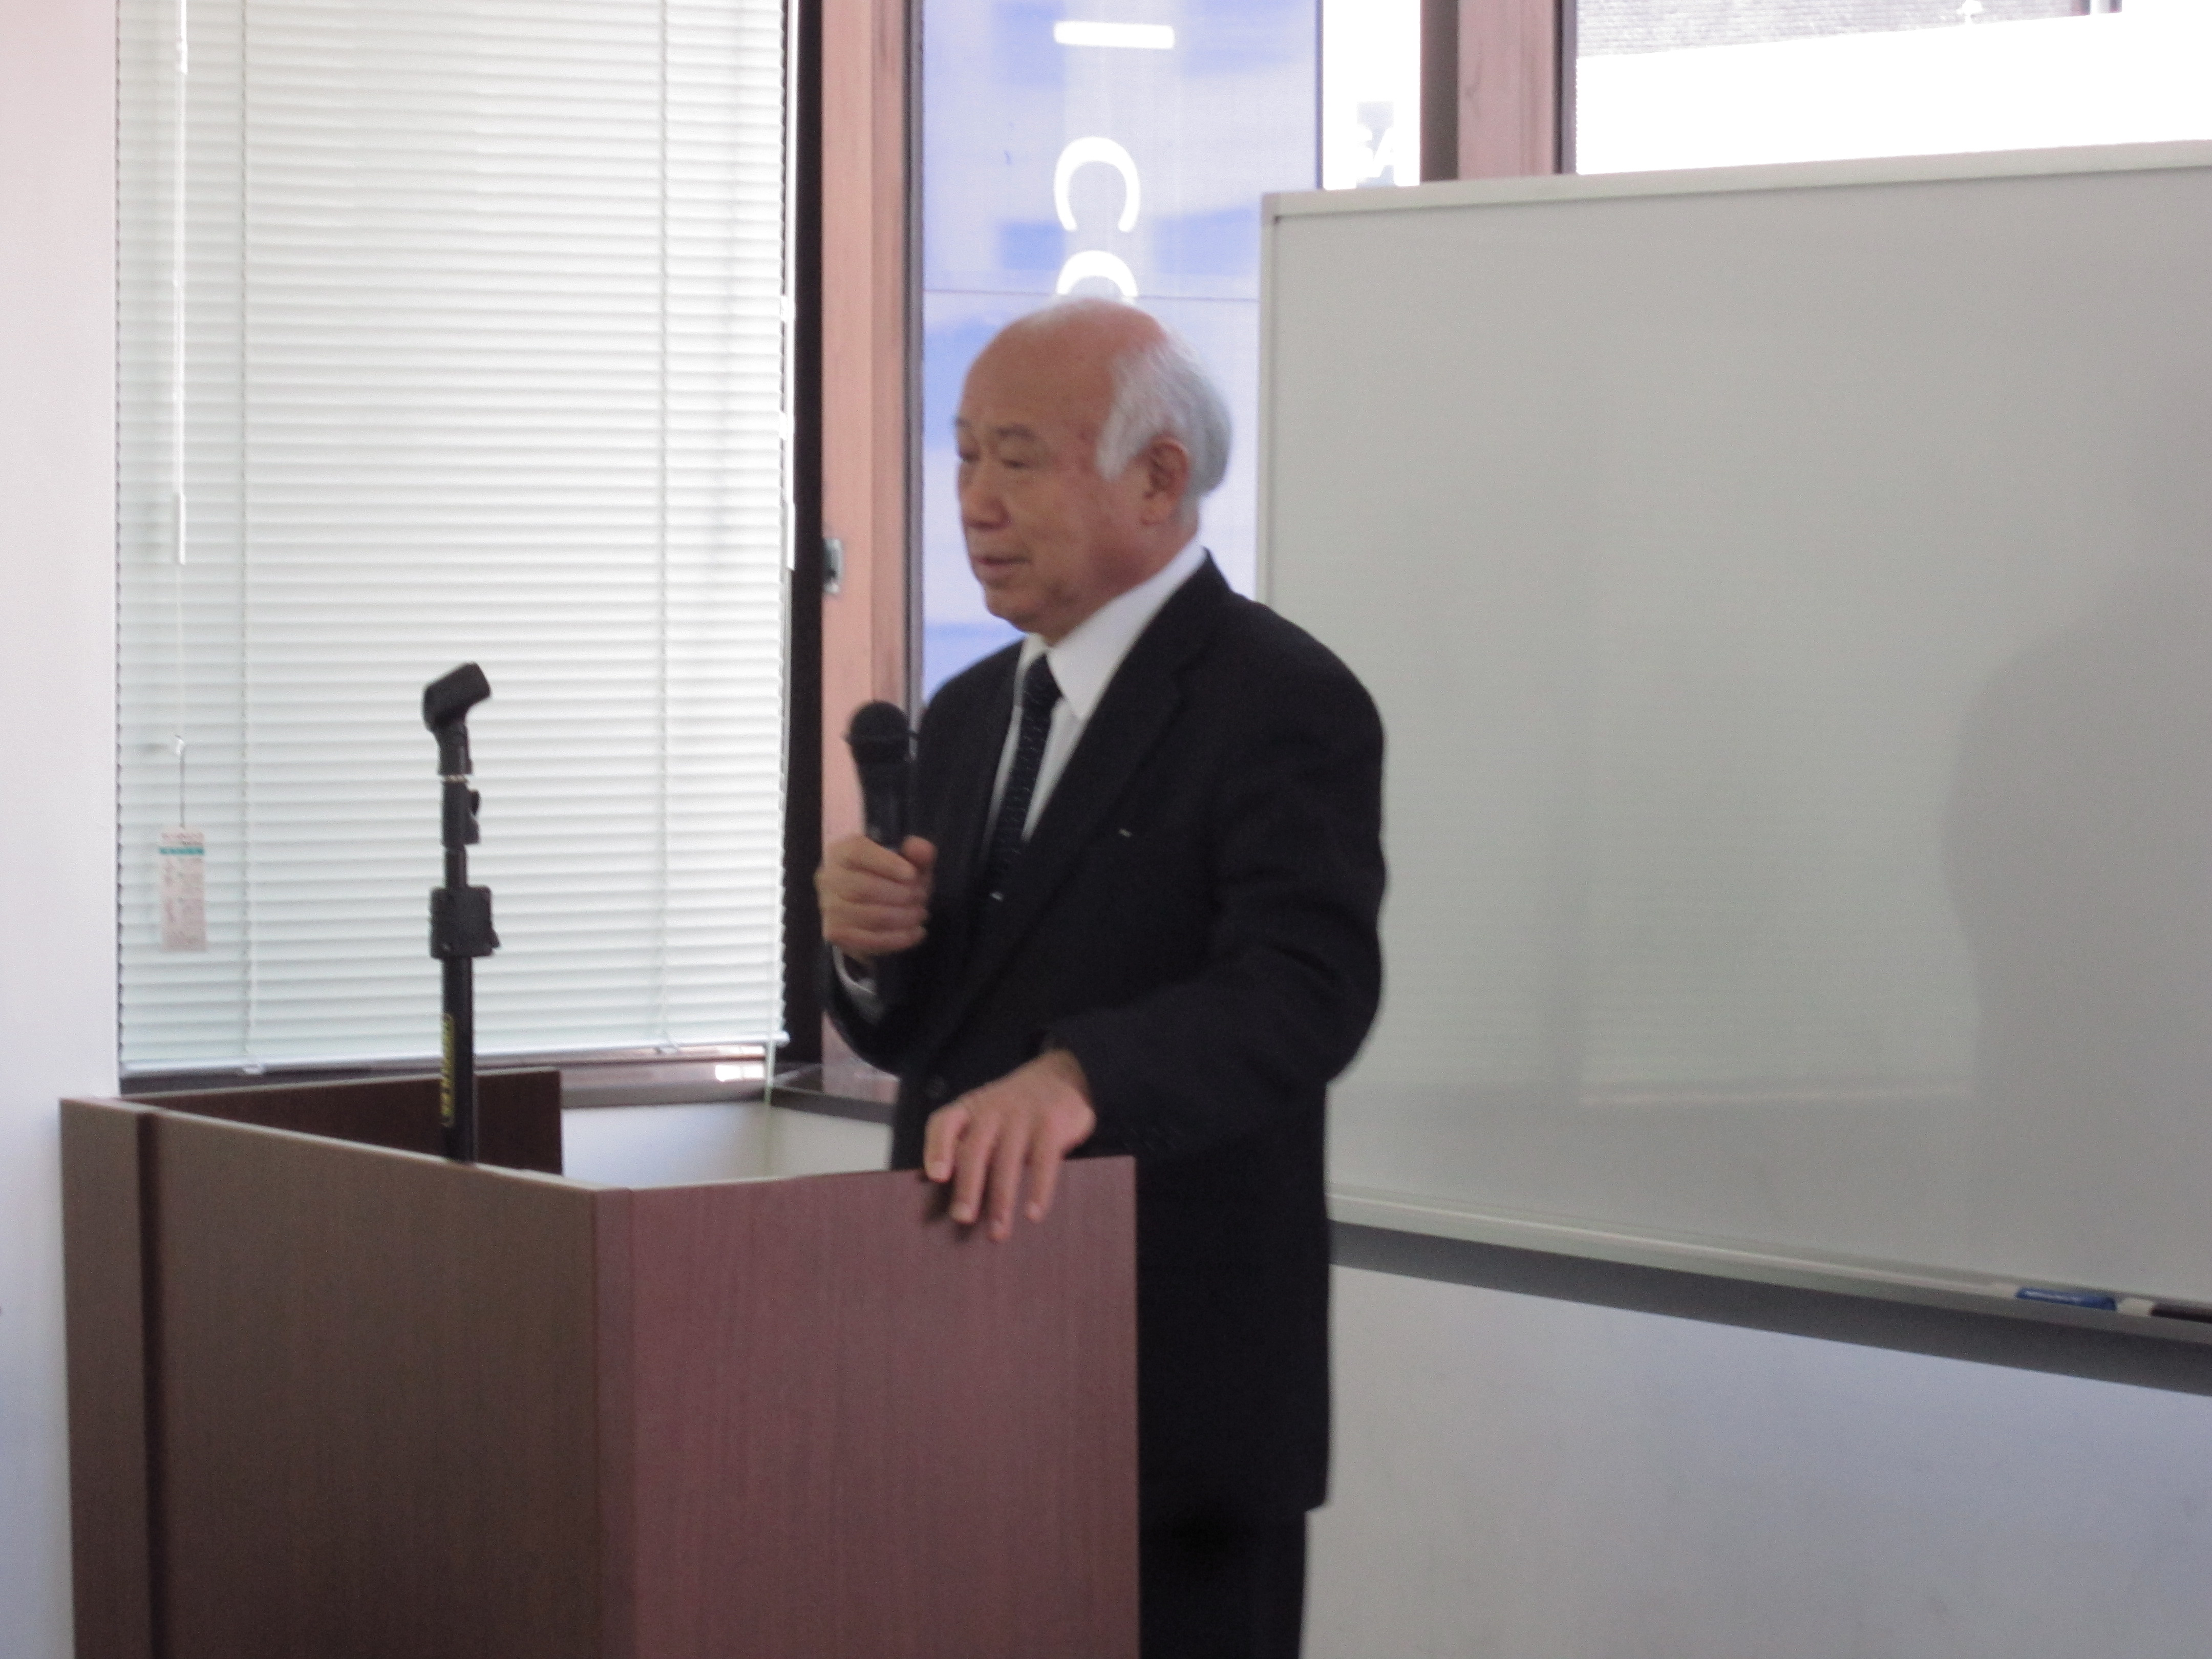 IMG 5590 - 4月1日東京思風塾の開催になります。